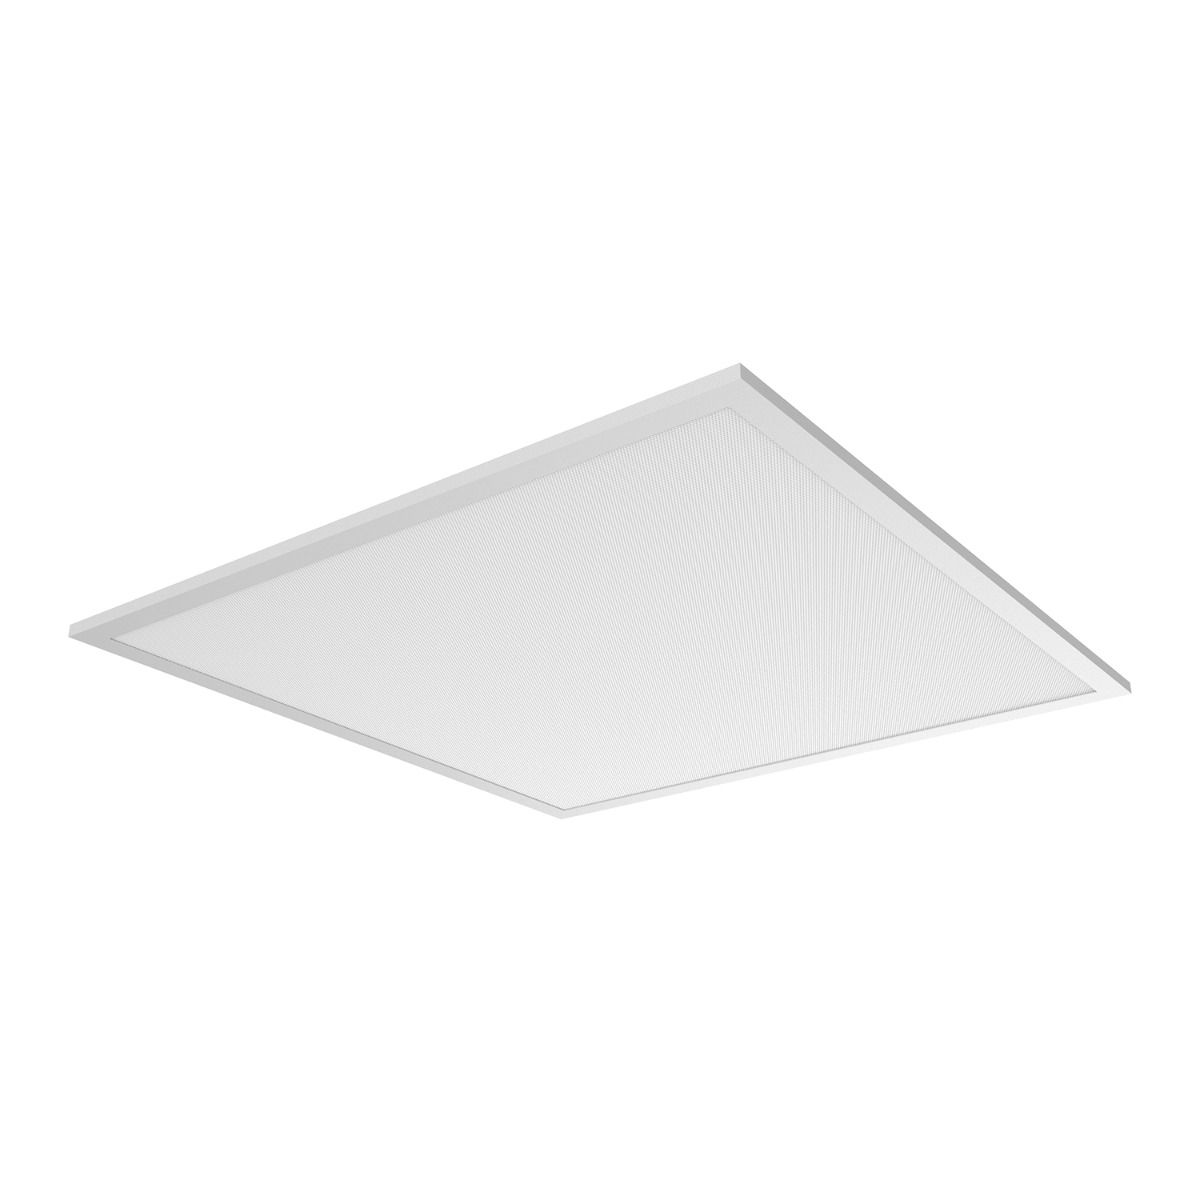 Noxion LED Panel Delta Pro V3 Highlum 36W 3000K 5225lm 60x60cm UGR <19 | Warm White - Replaces 4x18W